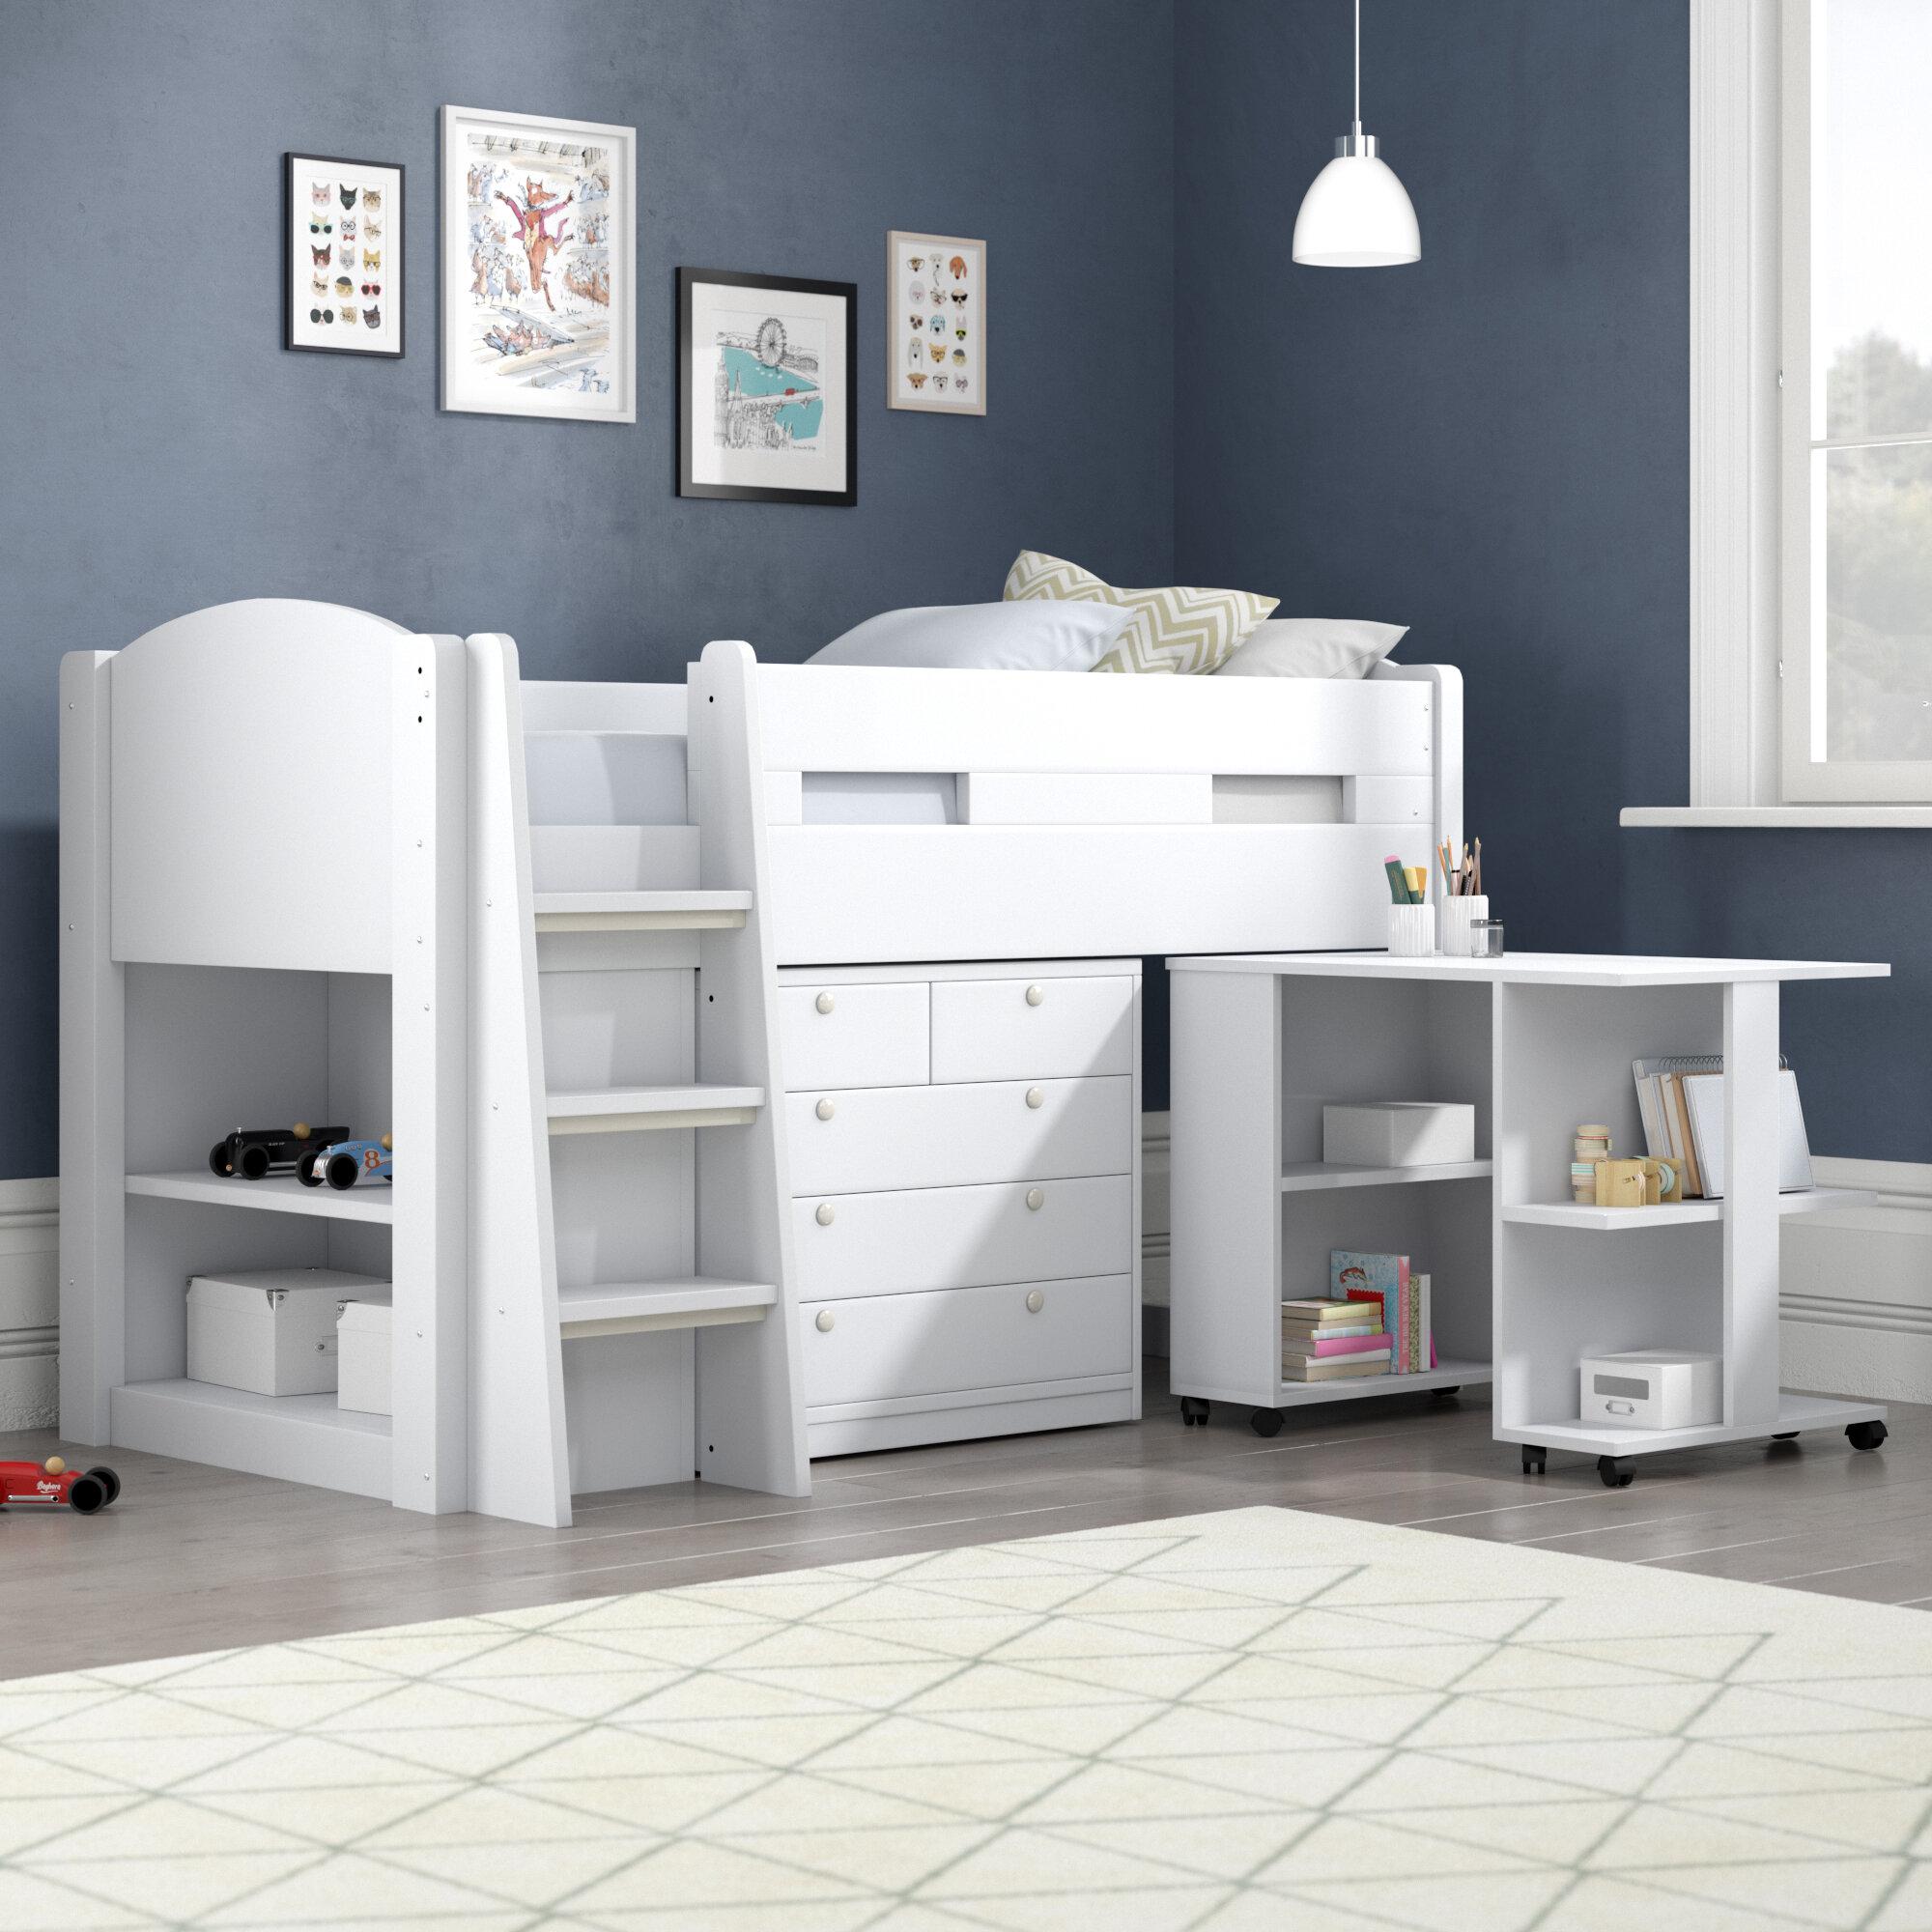 Flintshire Furniture Frankie Cabin Bed With Storage And Desk Reviews Wayfair Co Uk